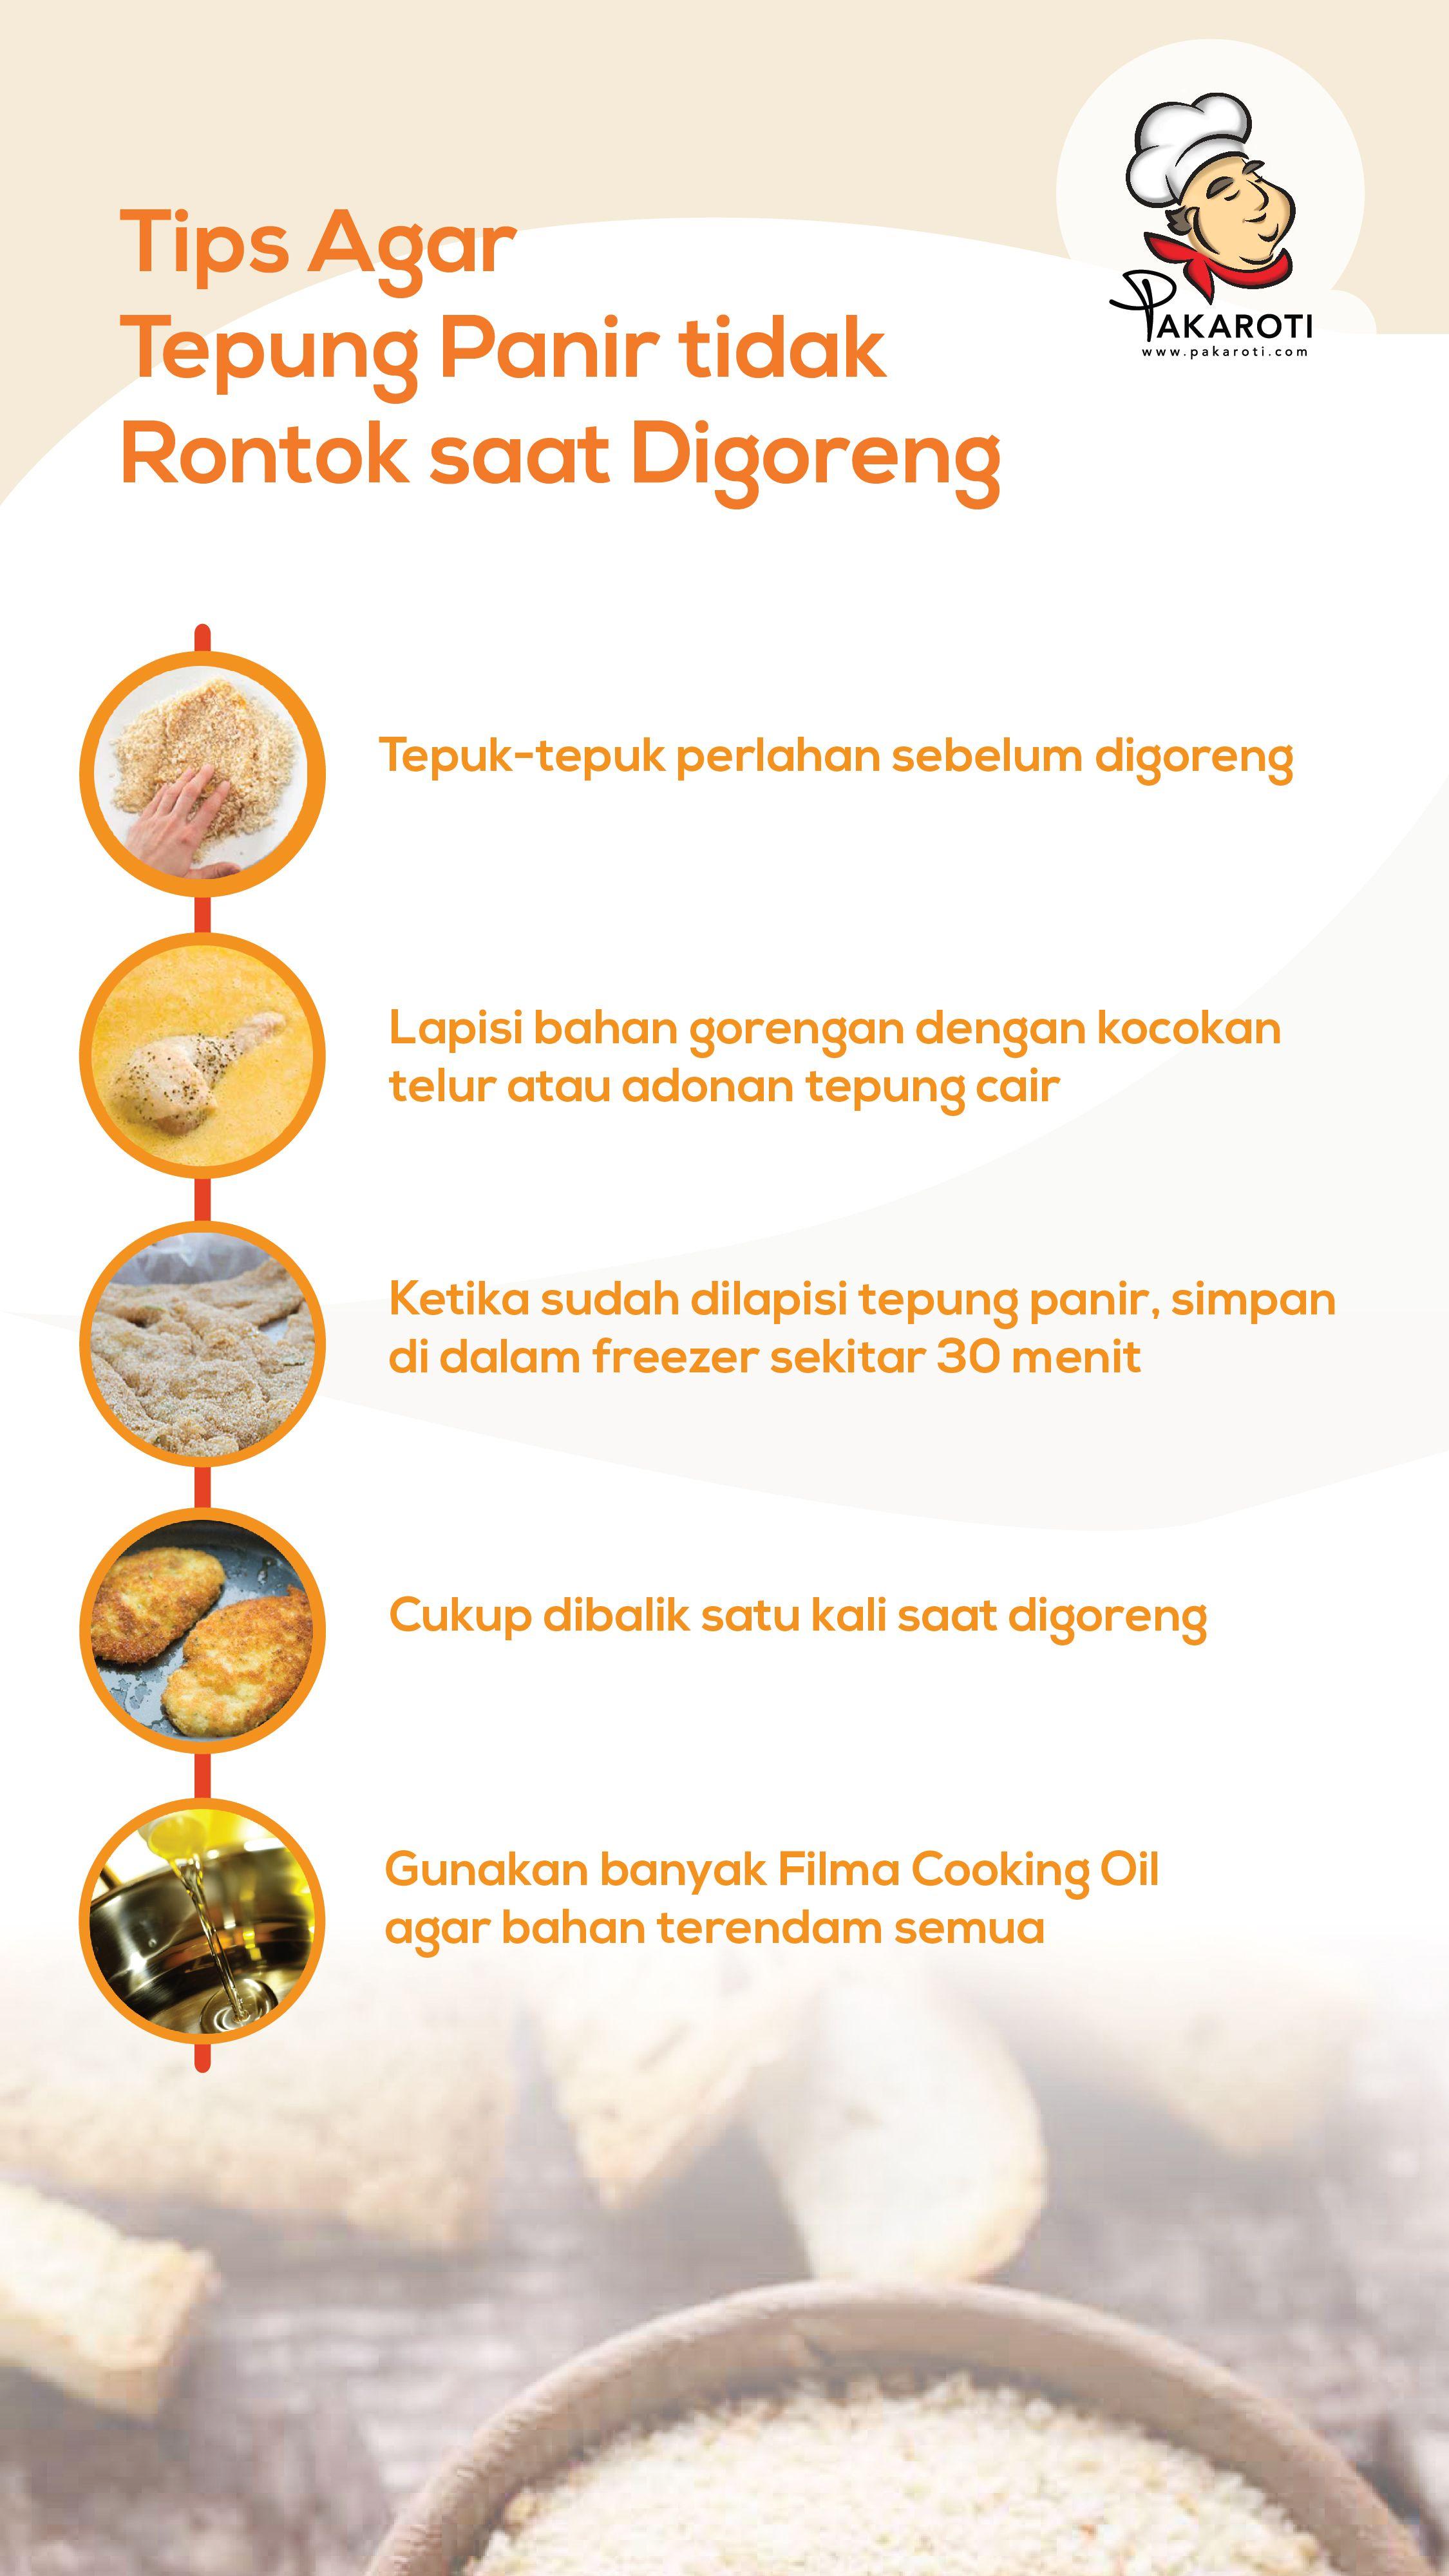 Pin Oleh Miming Di Tips Pakaroti Ide Makanan Resep Simpel Resep Makanan